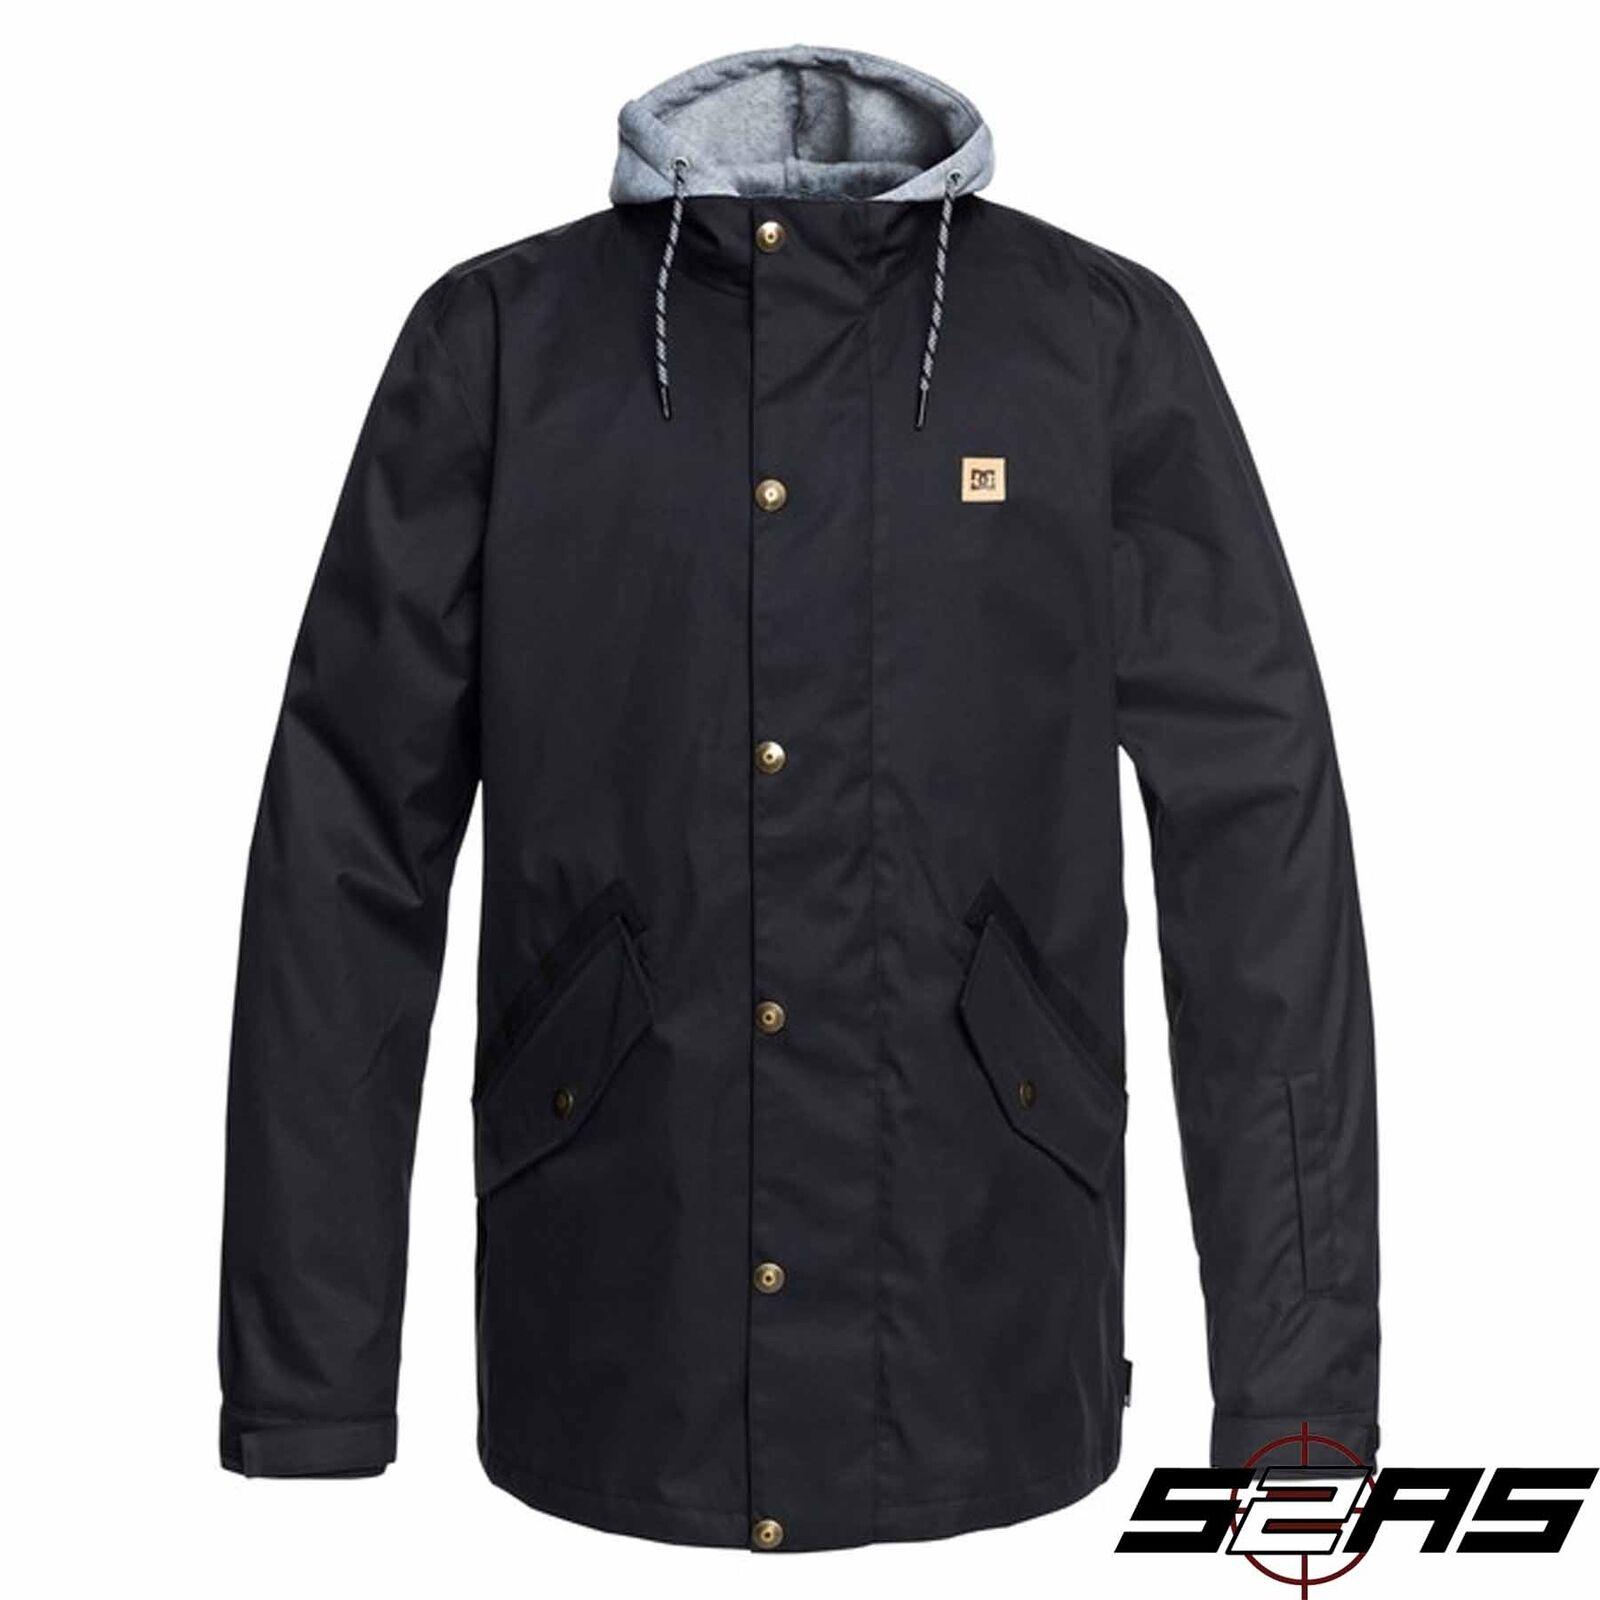 2019 DC chaqueta nieve Unión para hombre (negro)